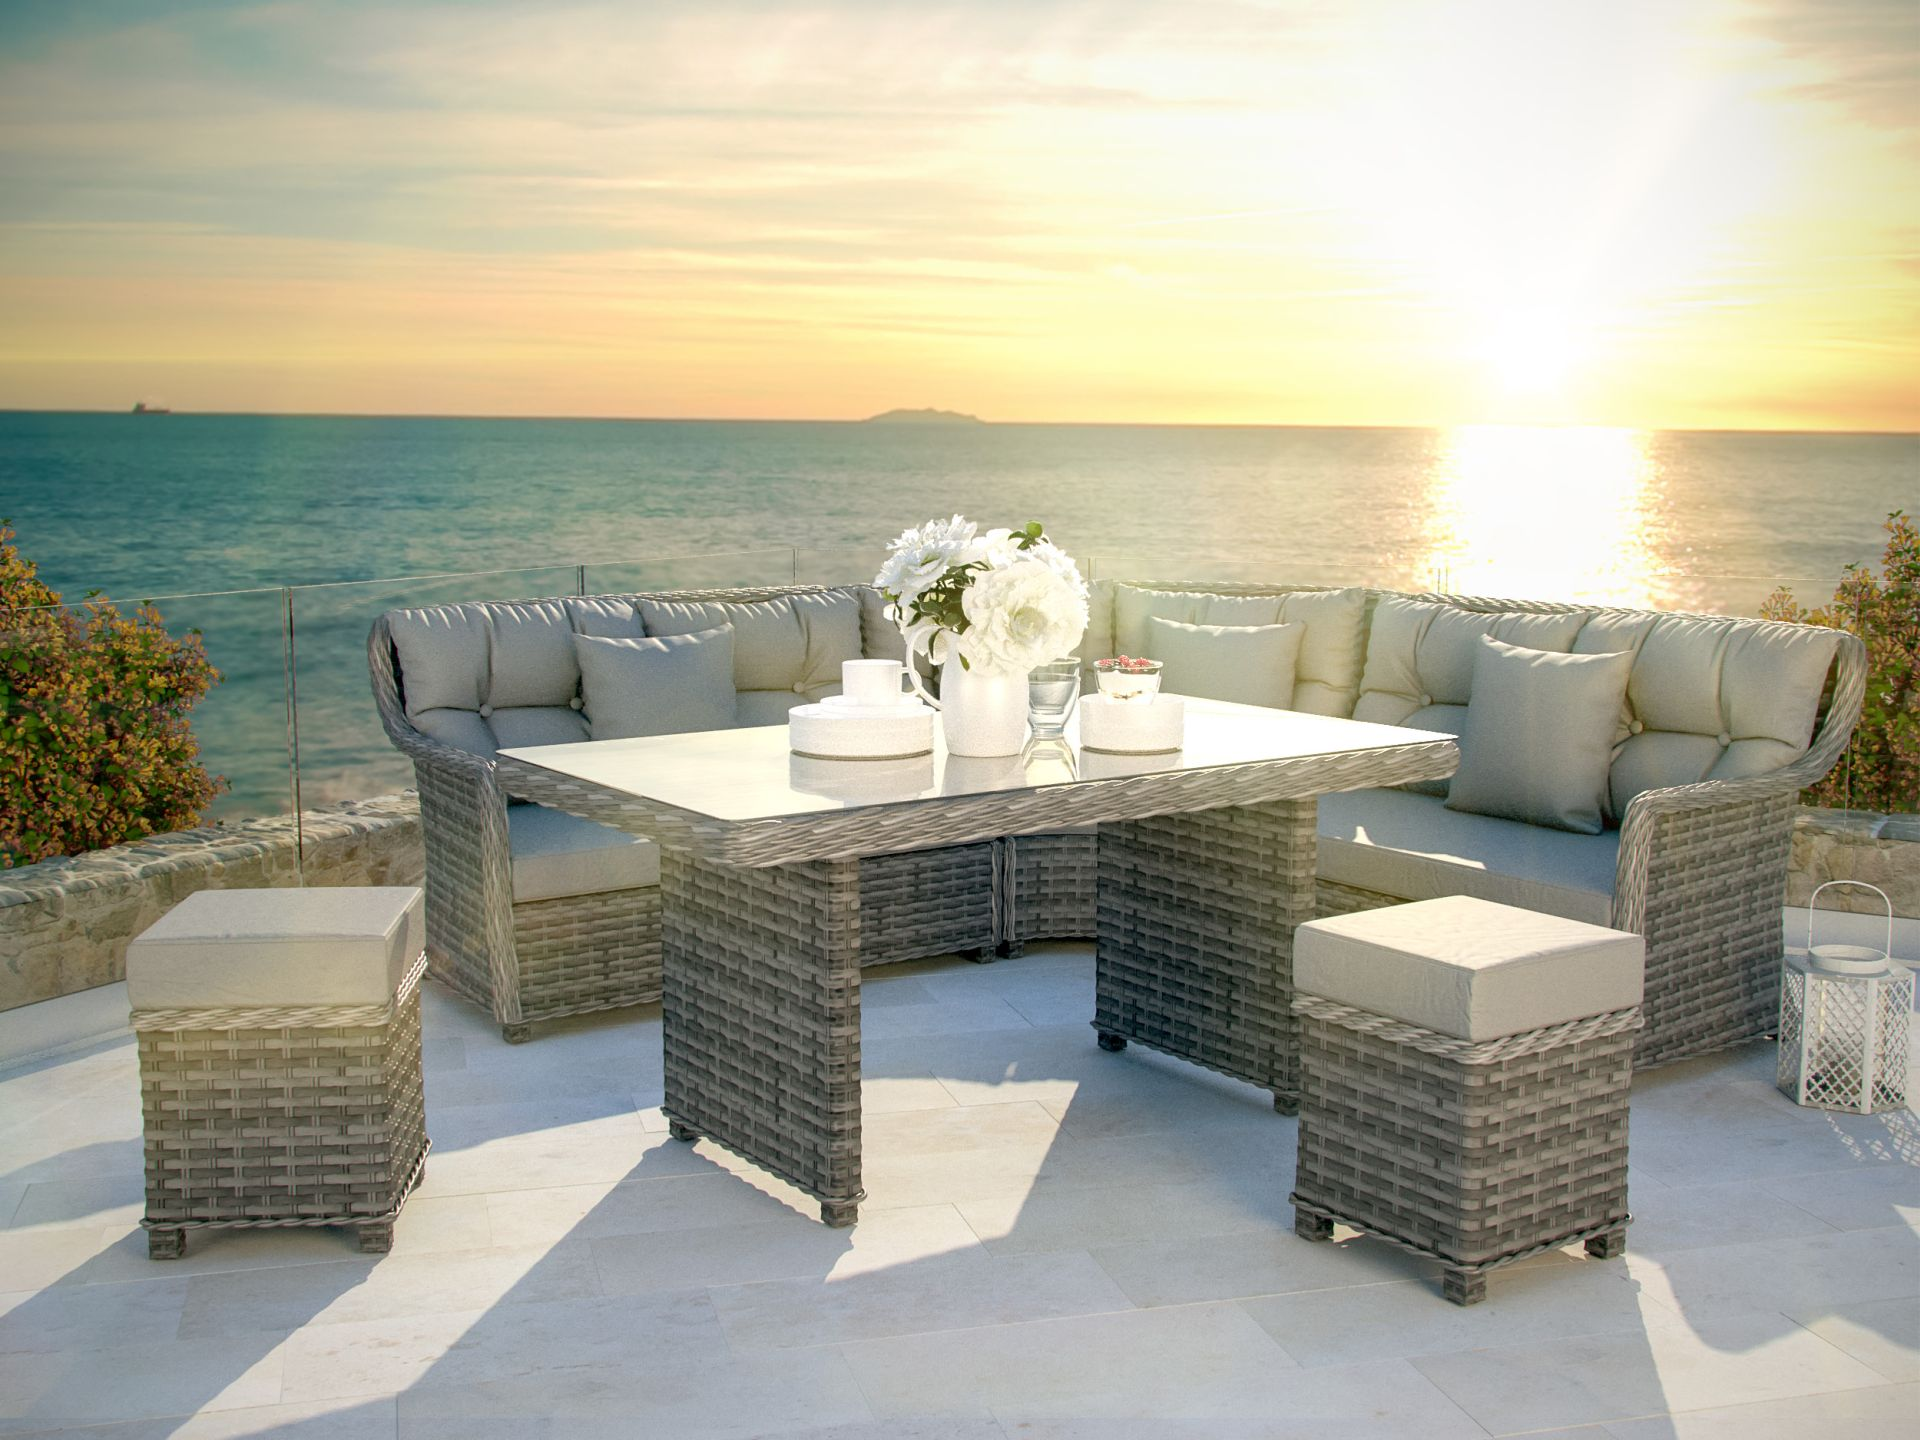 artelia gartenm bel my blog. Black Bedroom Furniture Sets. Home Design Ideas